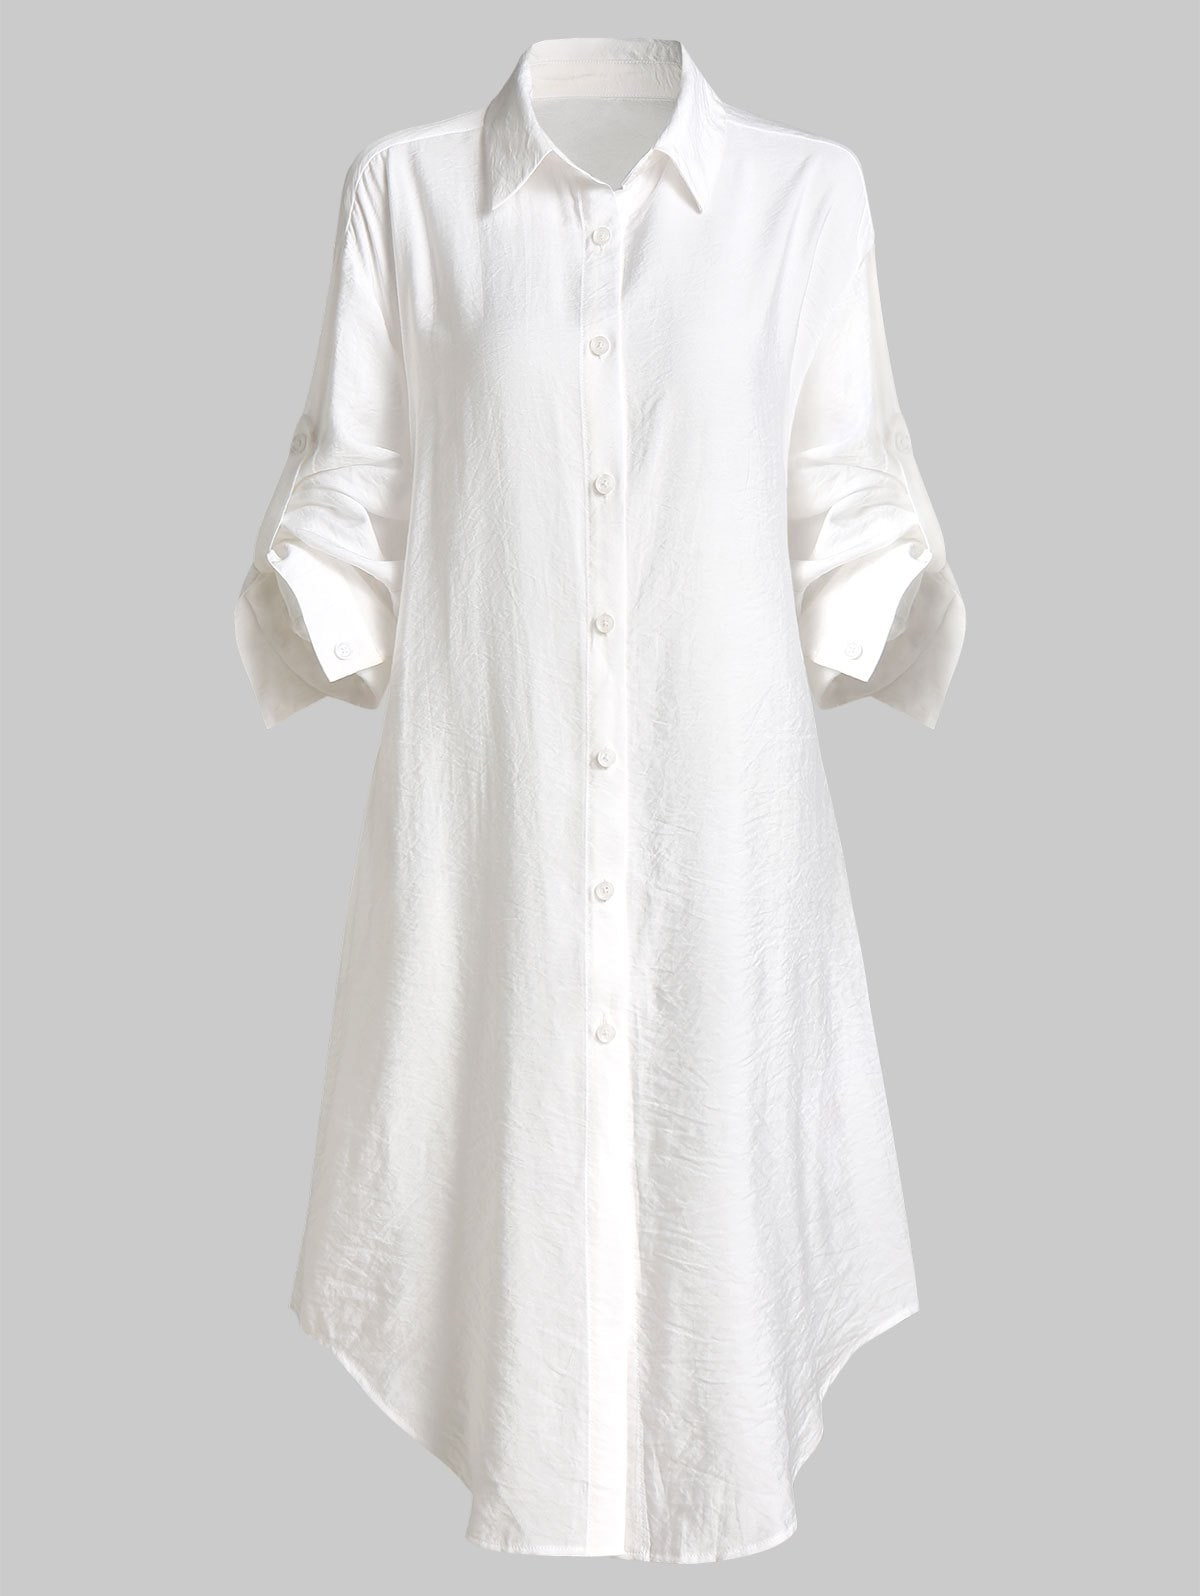 Roll Tab Sleeve Button Up Longling Shirt